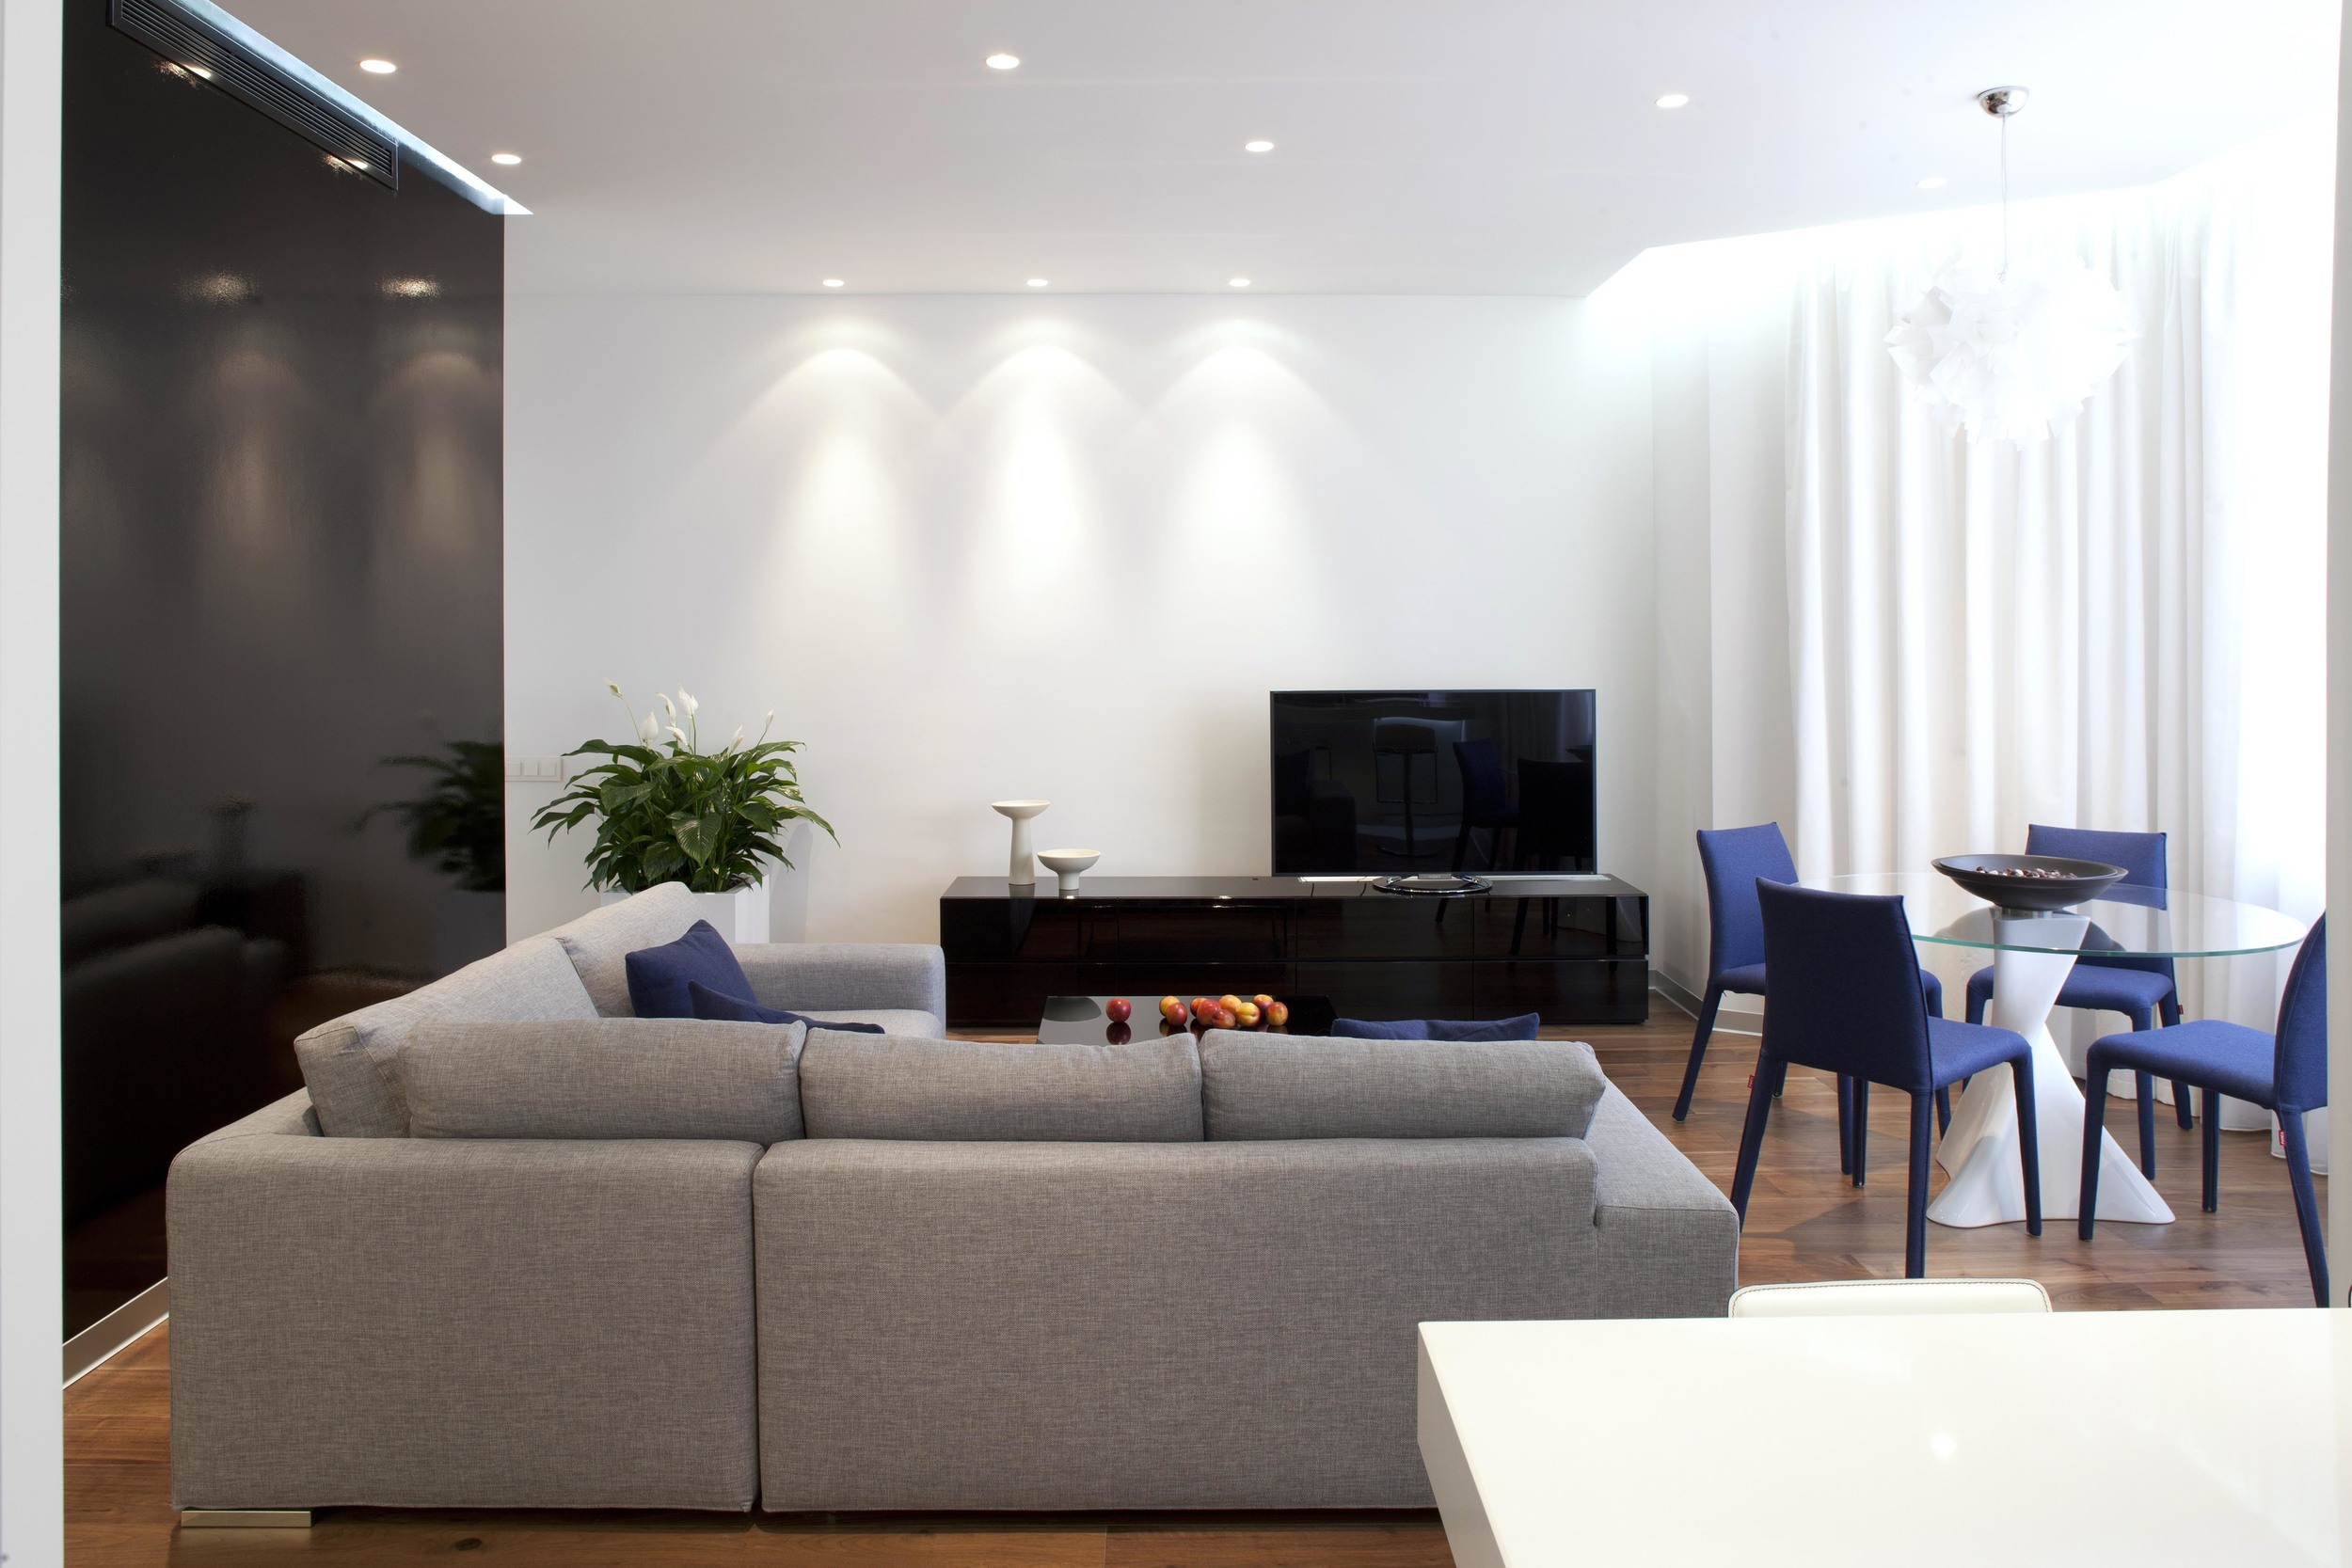 01_ub_pechatnikov3_livingroom_1.jpg